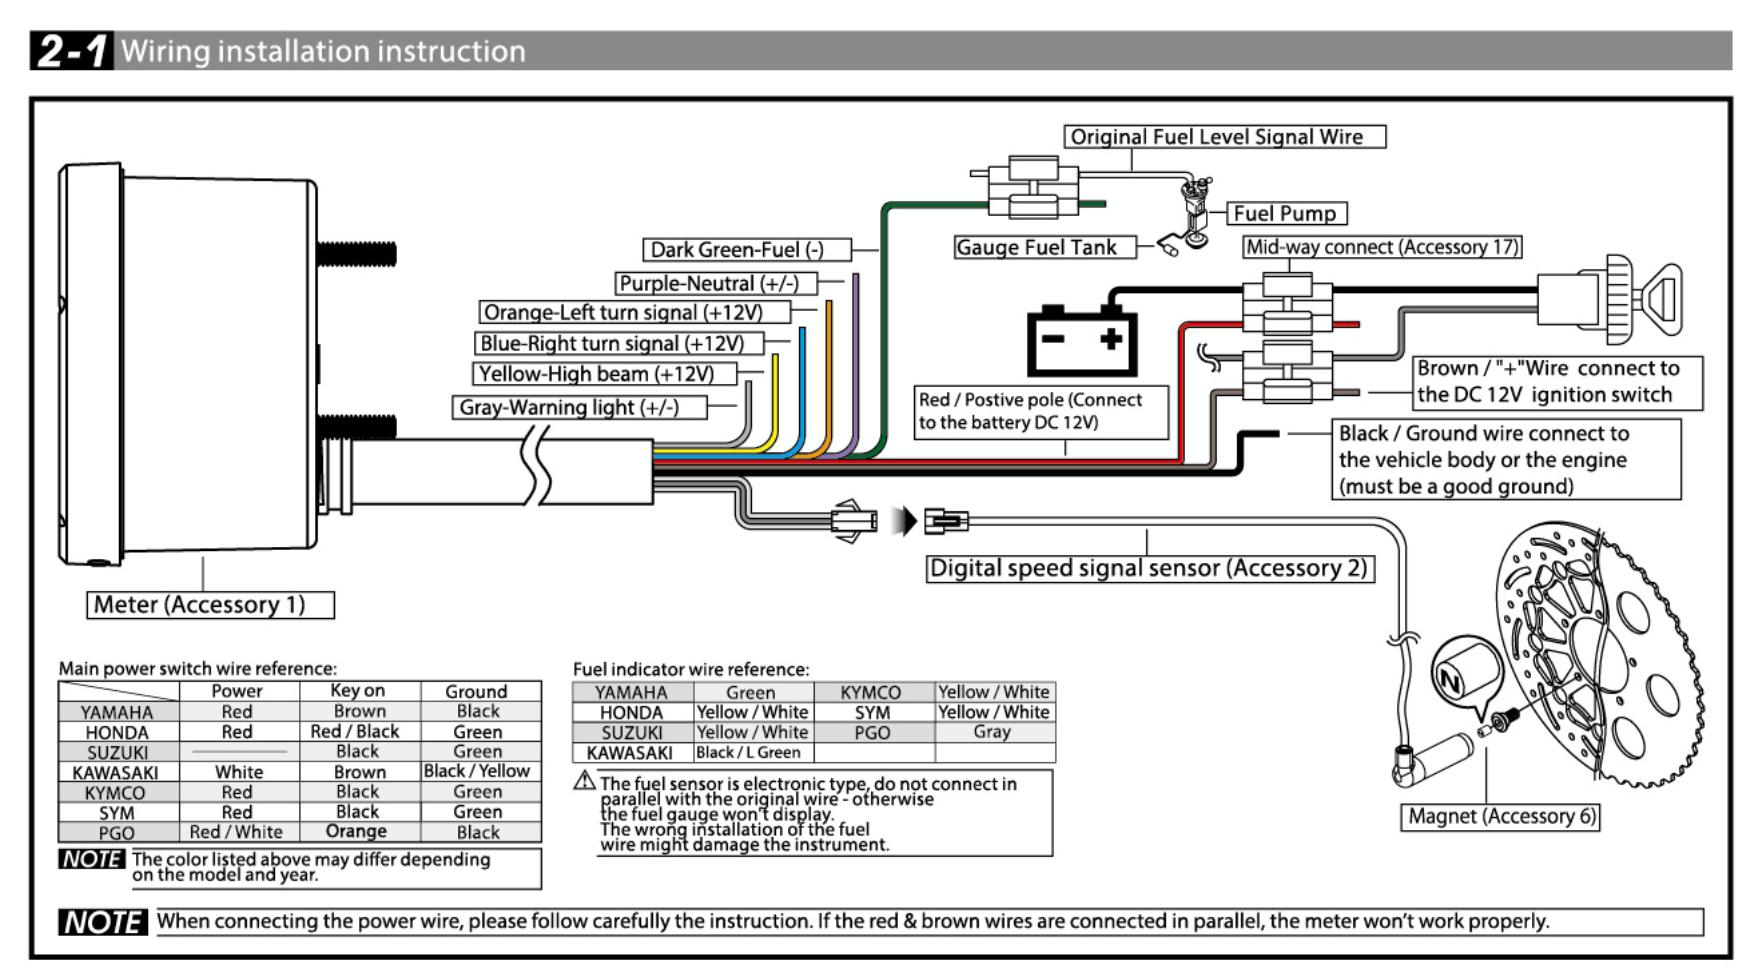 yamaha digital gauge wiring diagram yamaha speed fuel gauge wiring diagram wiring diagram e10  yamaha speed fuel gauge wiring diagram